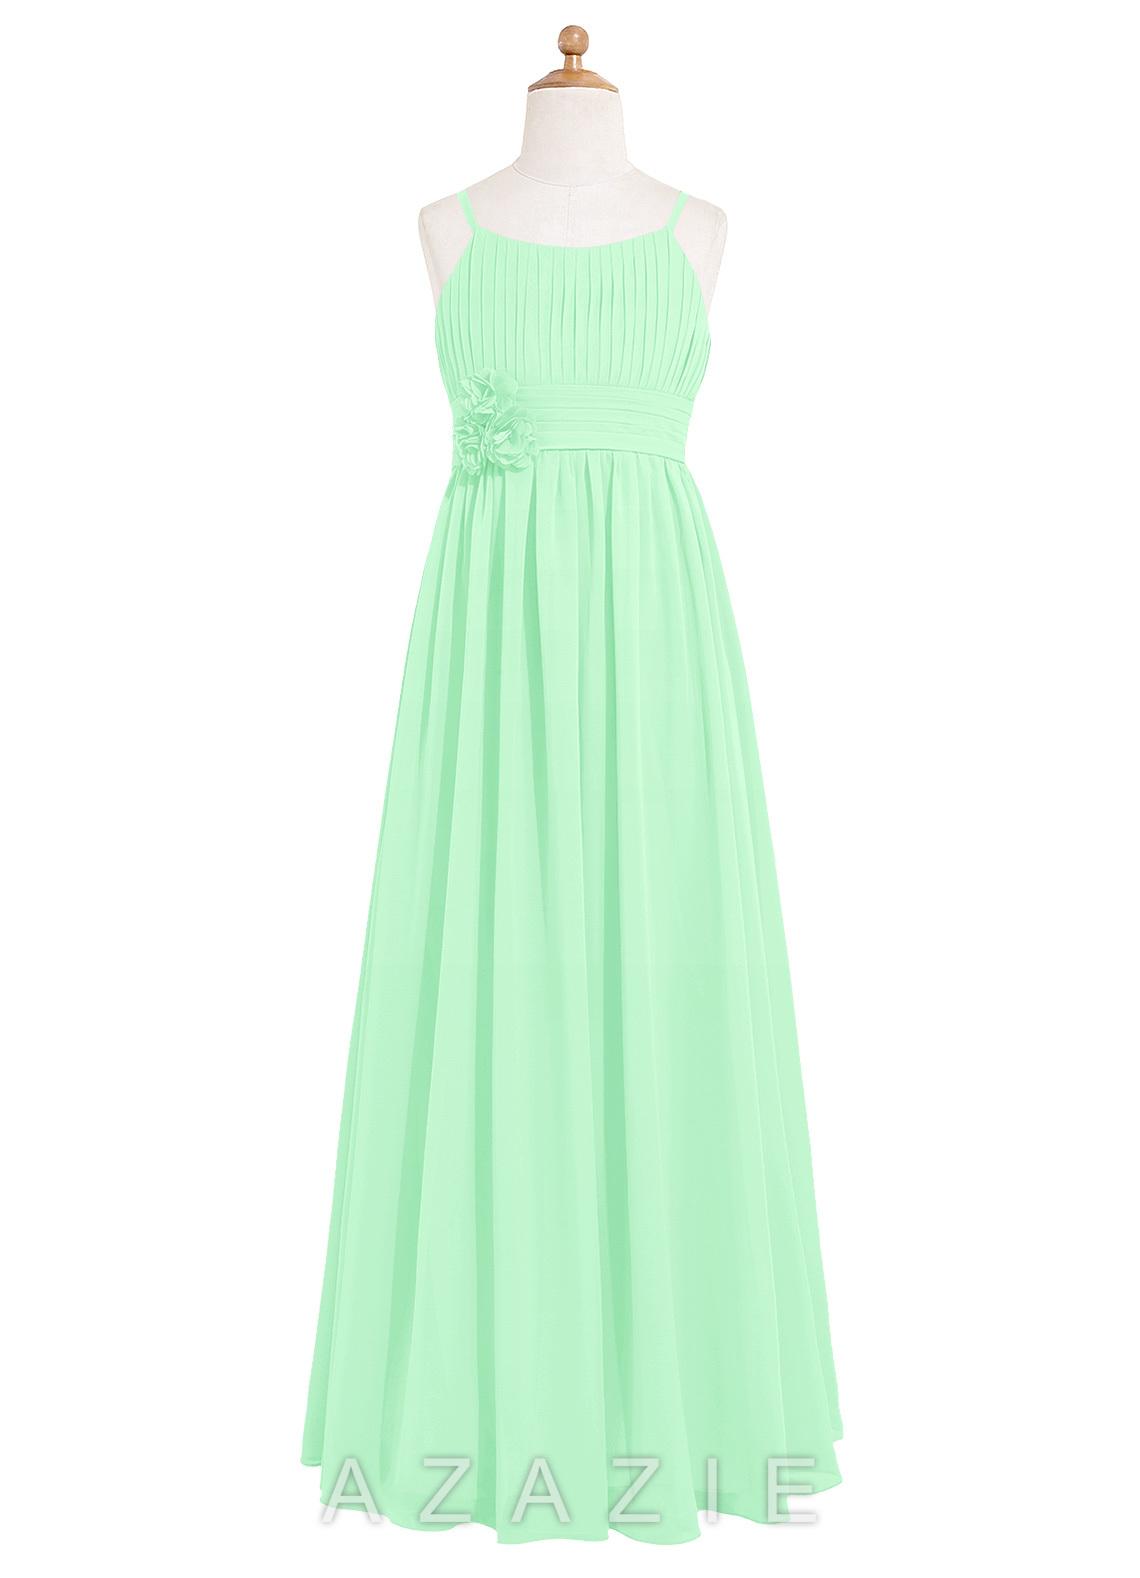 Azazie astrid jbd junior bridesmaid dress azazie color mint green ombrellifo Image collections